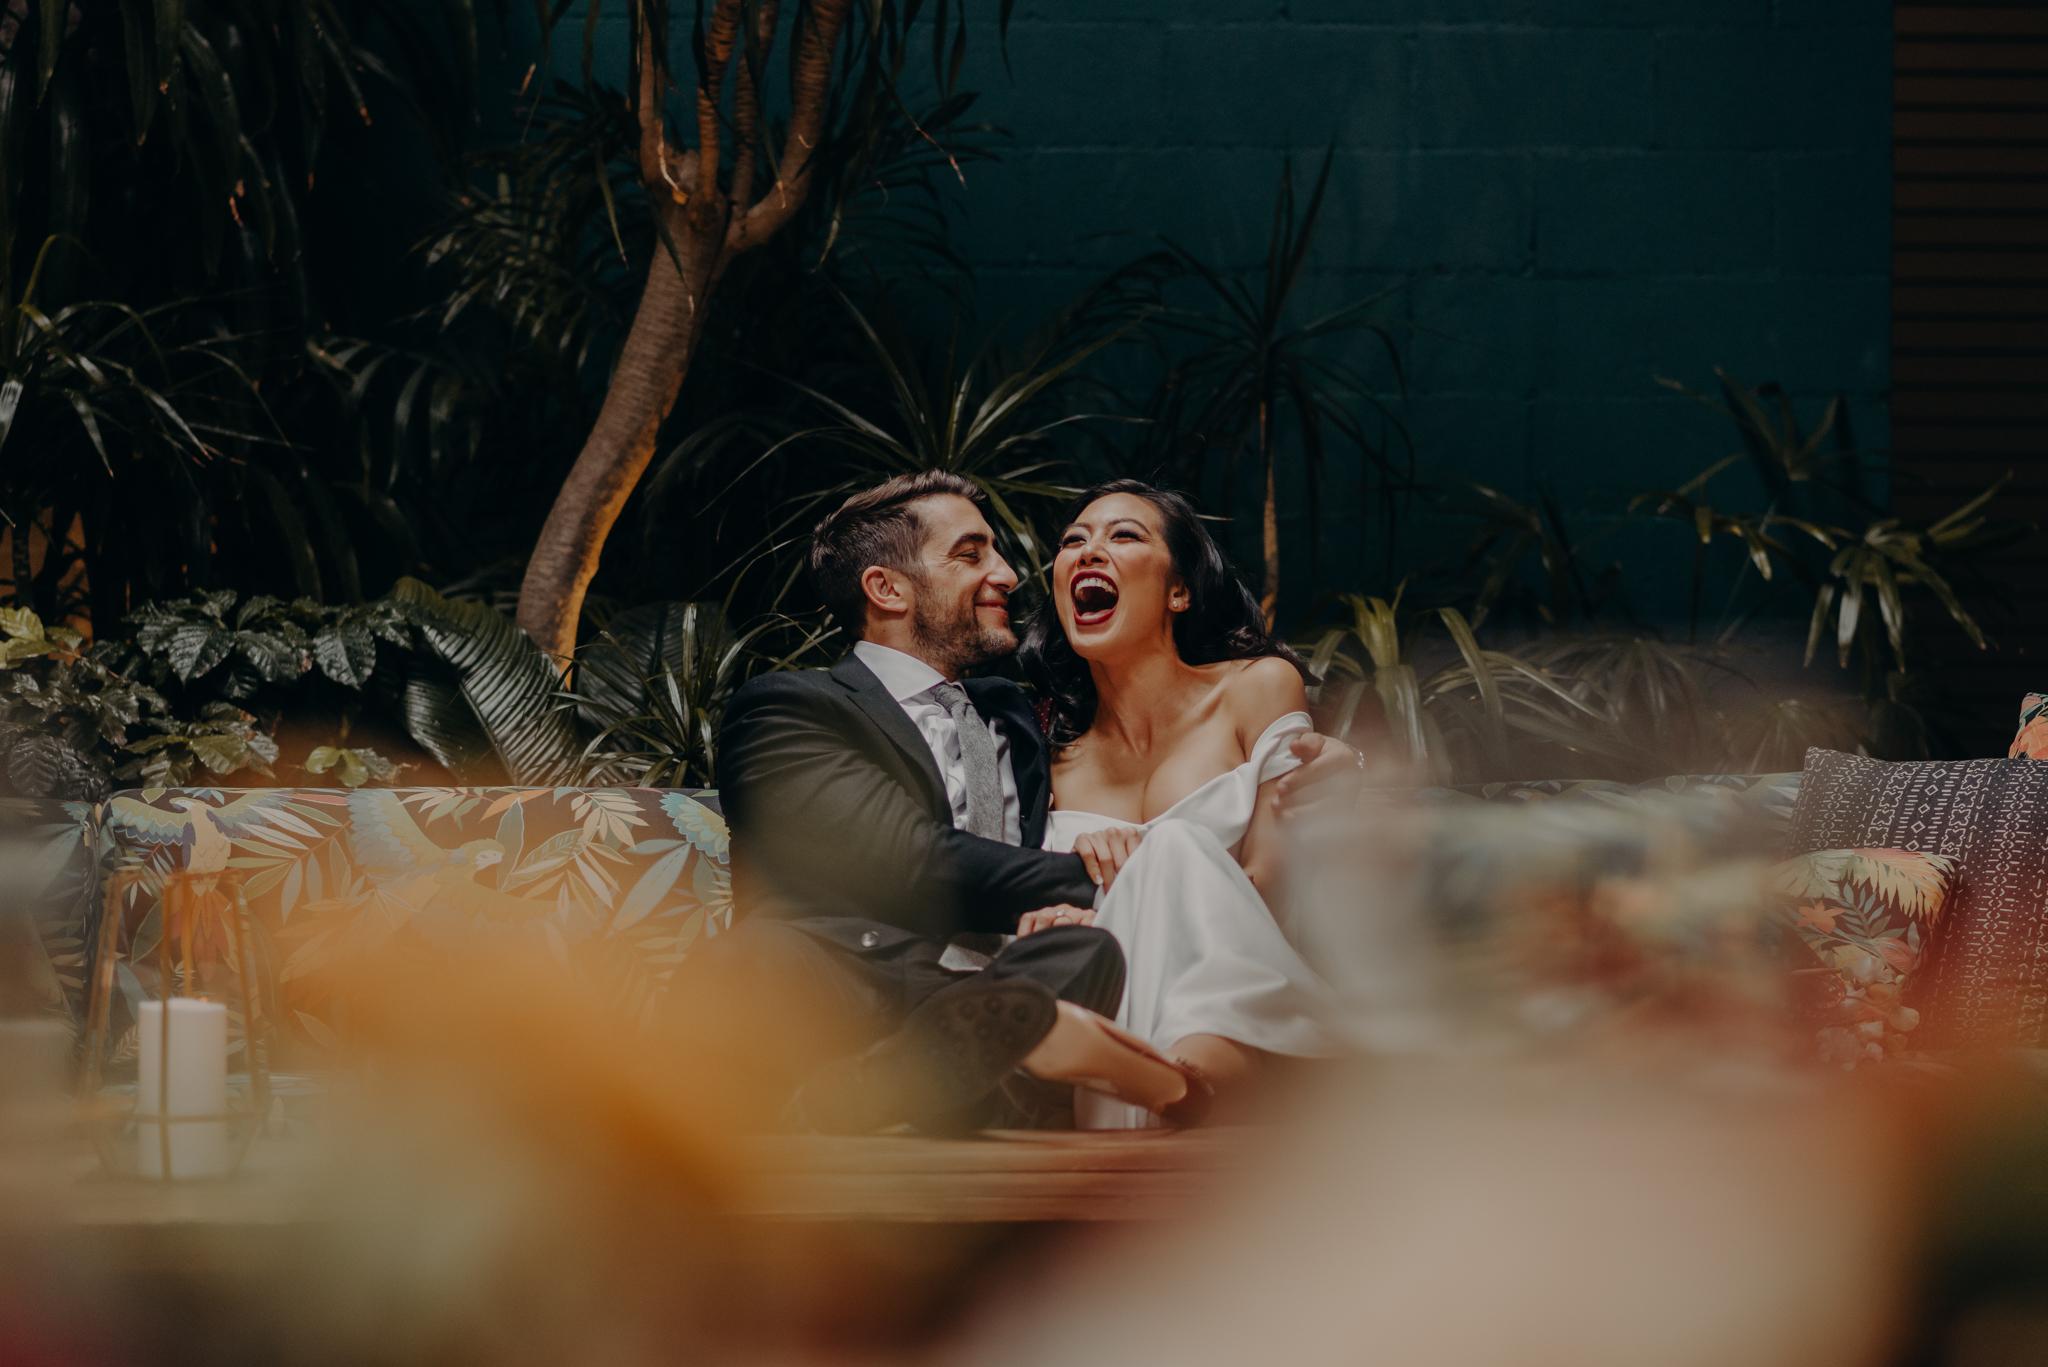 Wedding Photo LA - wedding photographer in los angeles - millwick wedding venue -isaiahandtaylor.com-038.jpg